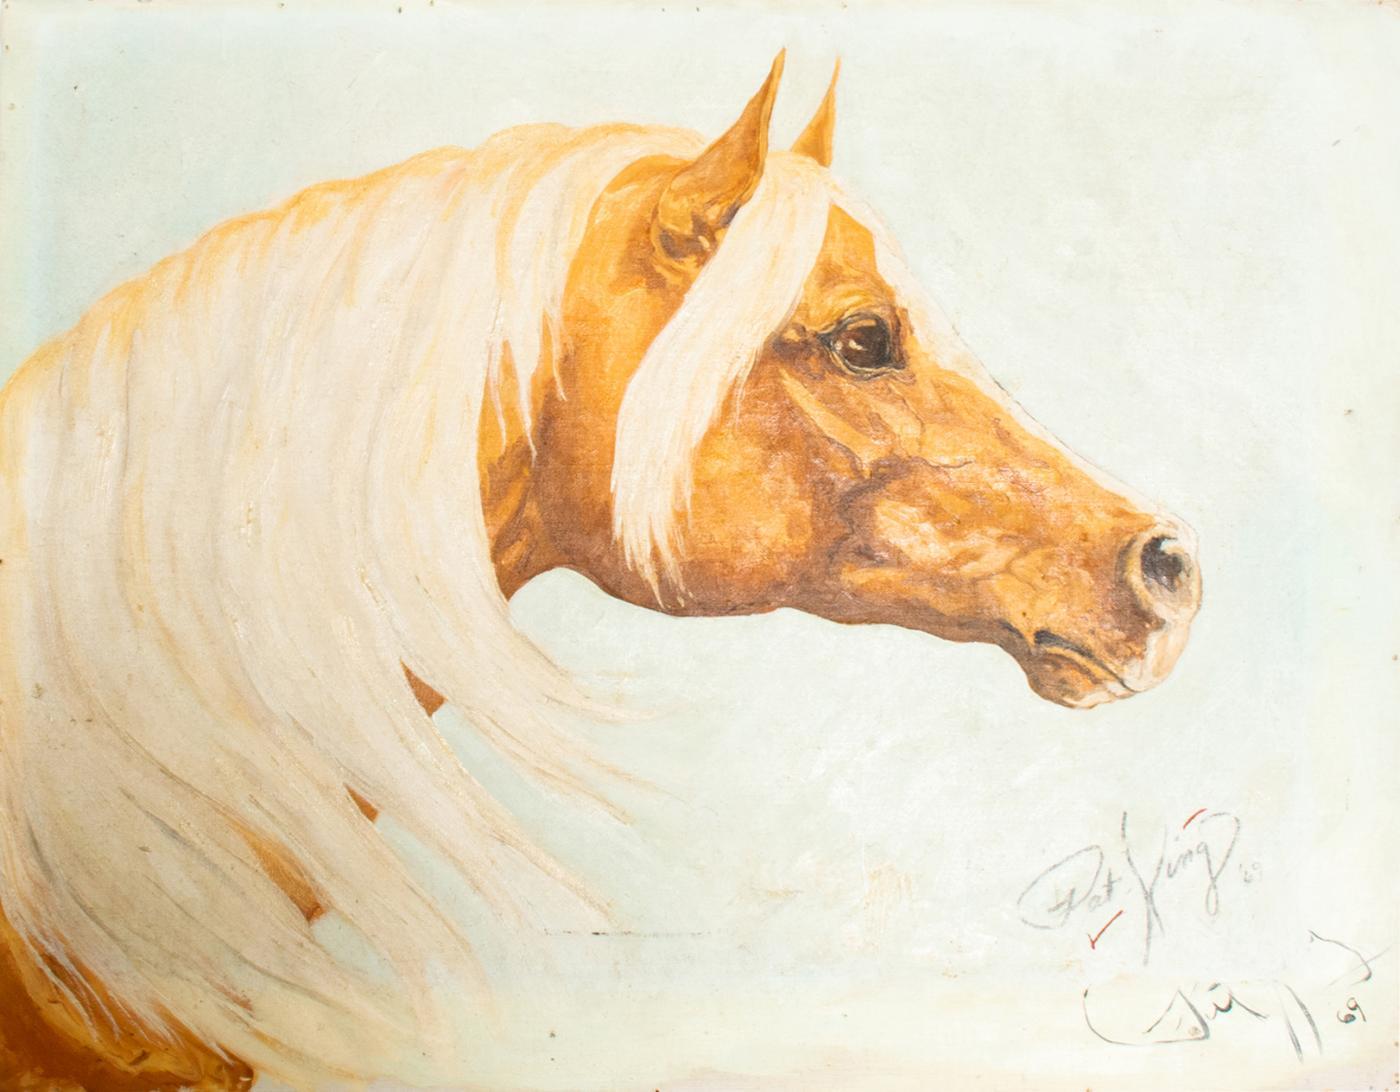 Pat King Handsome Palomino Horse Oil Painting Midcentury Modern Art Signed Pat King 1969